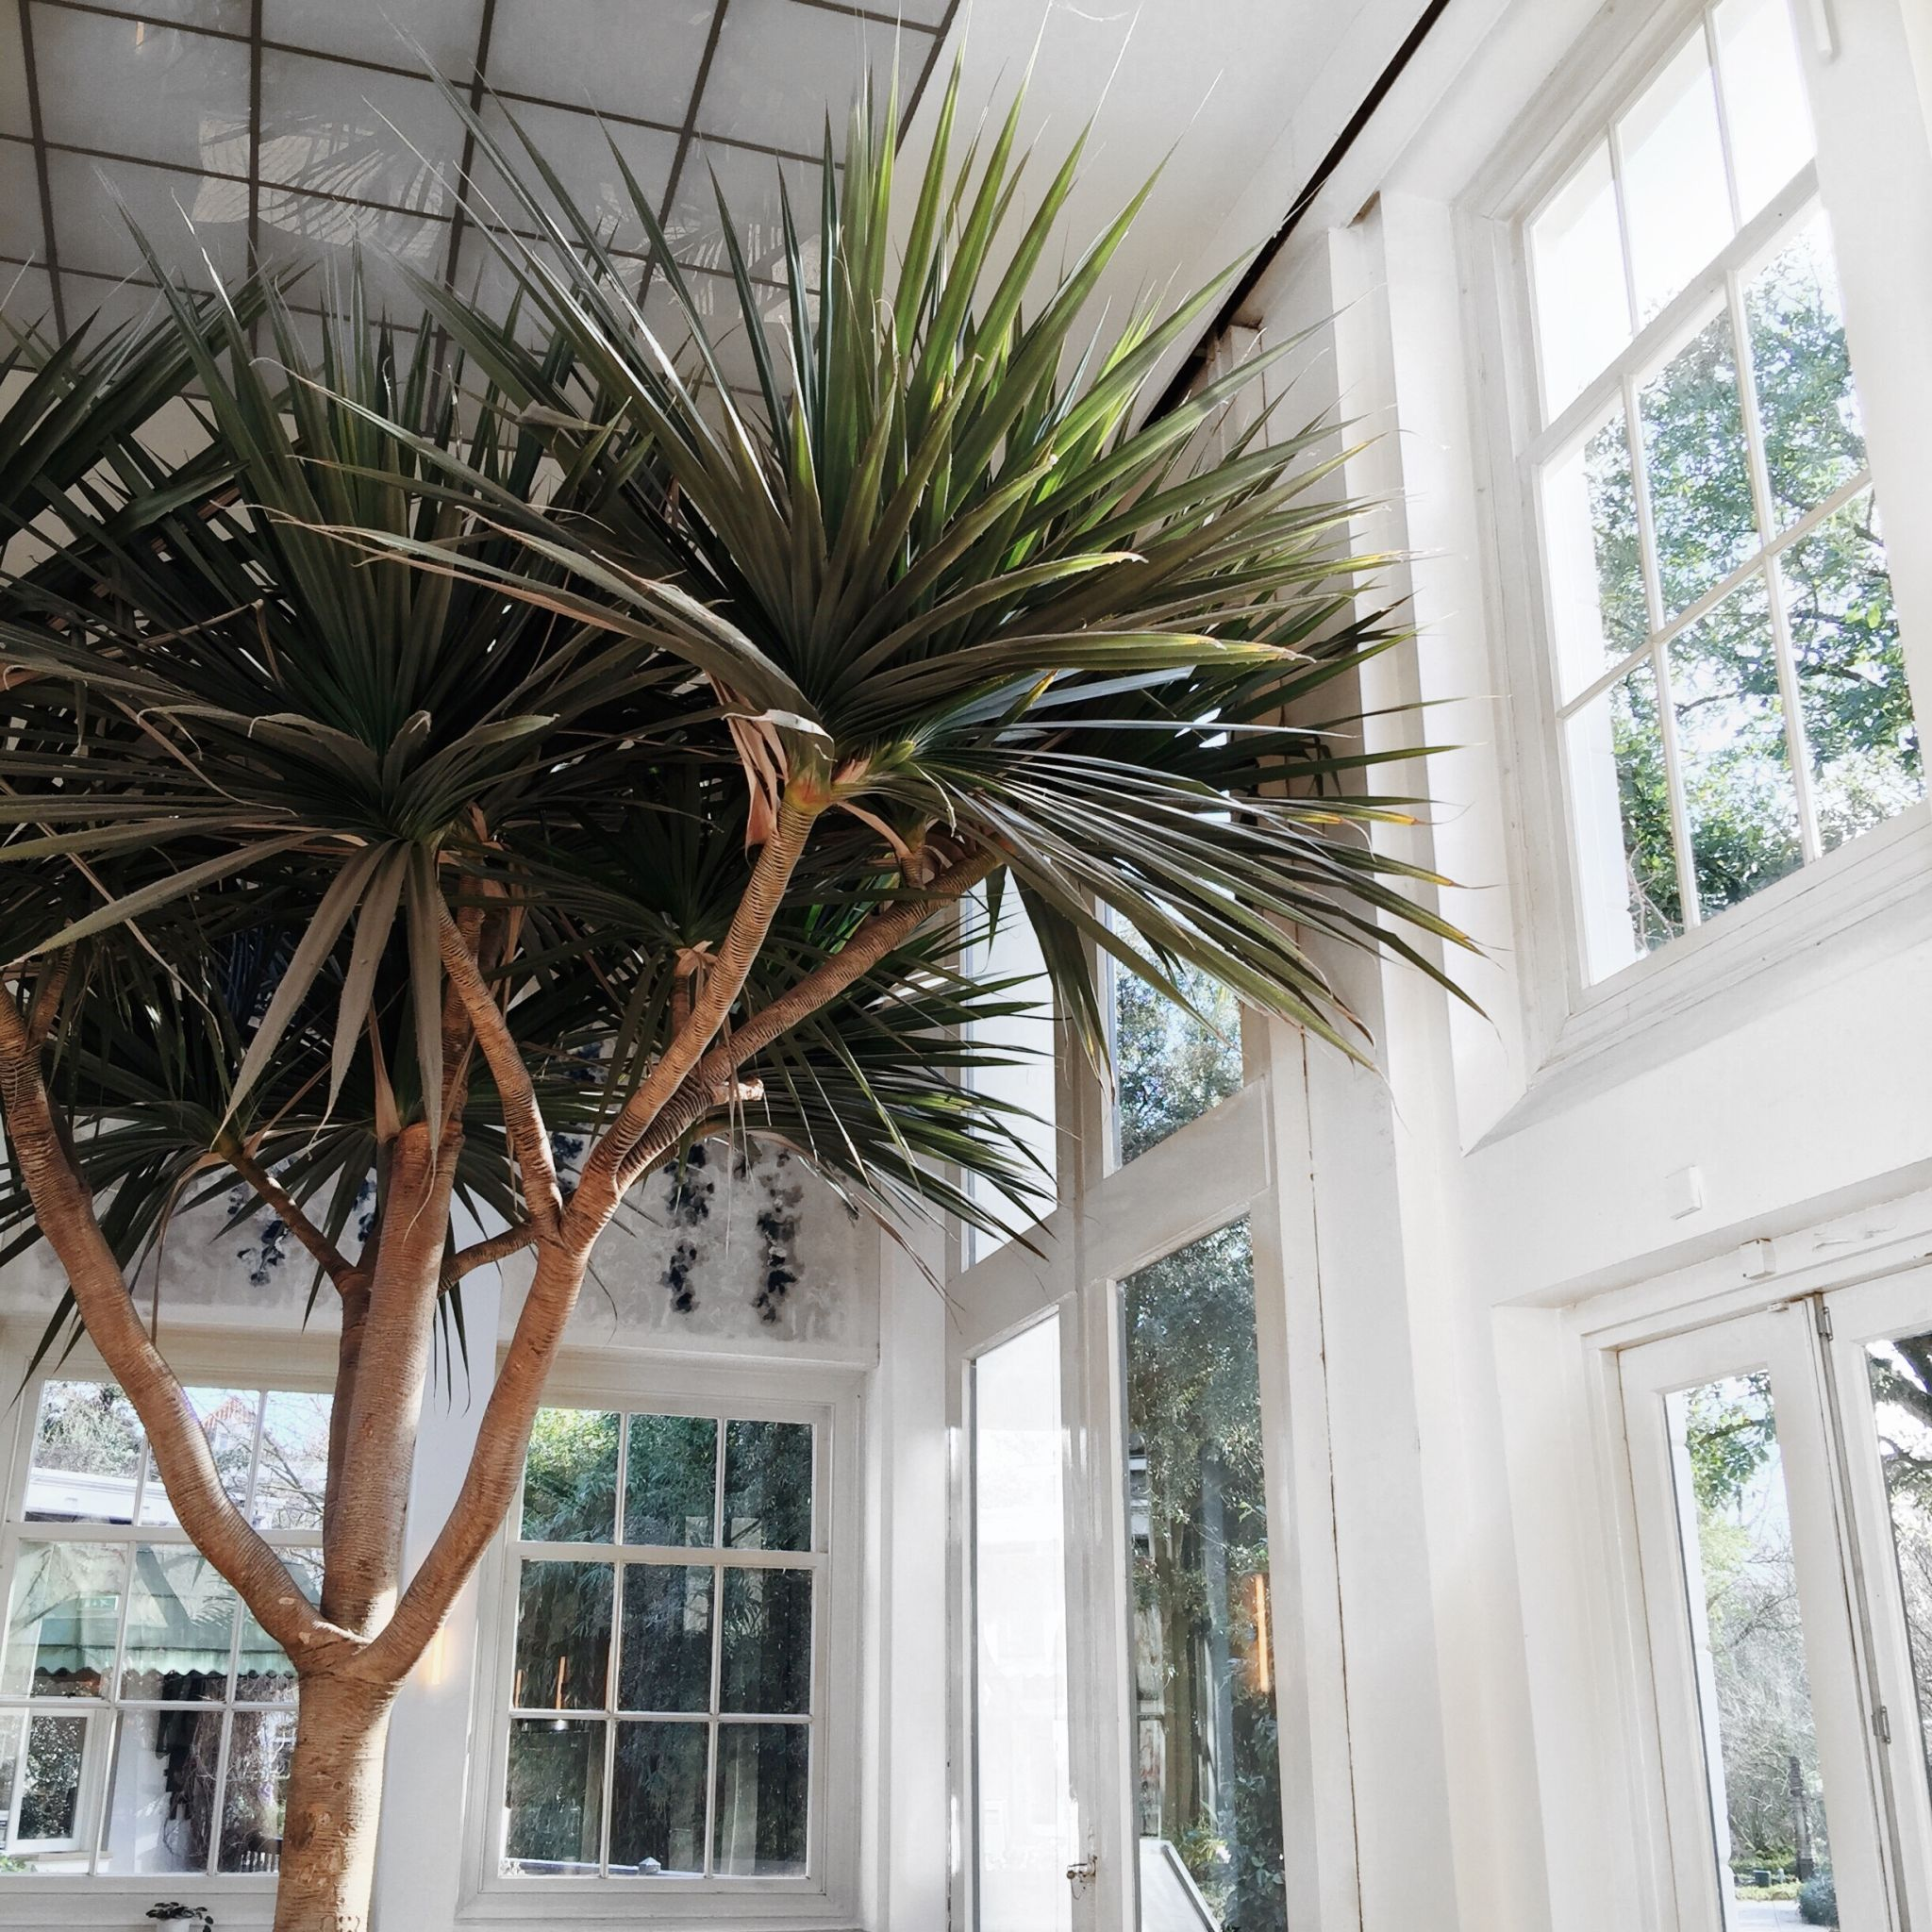 hortus-botanicus-amsterdam-botanic-garden